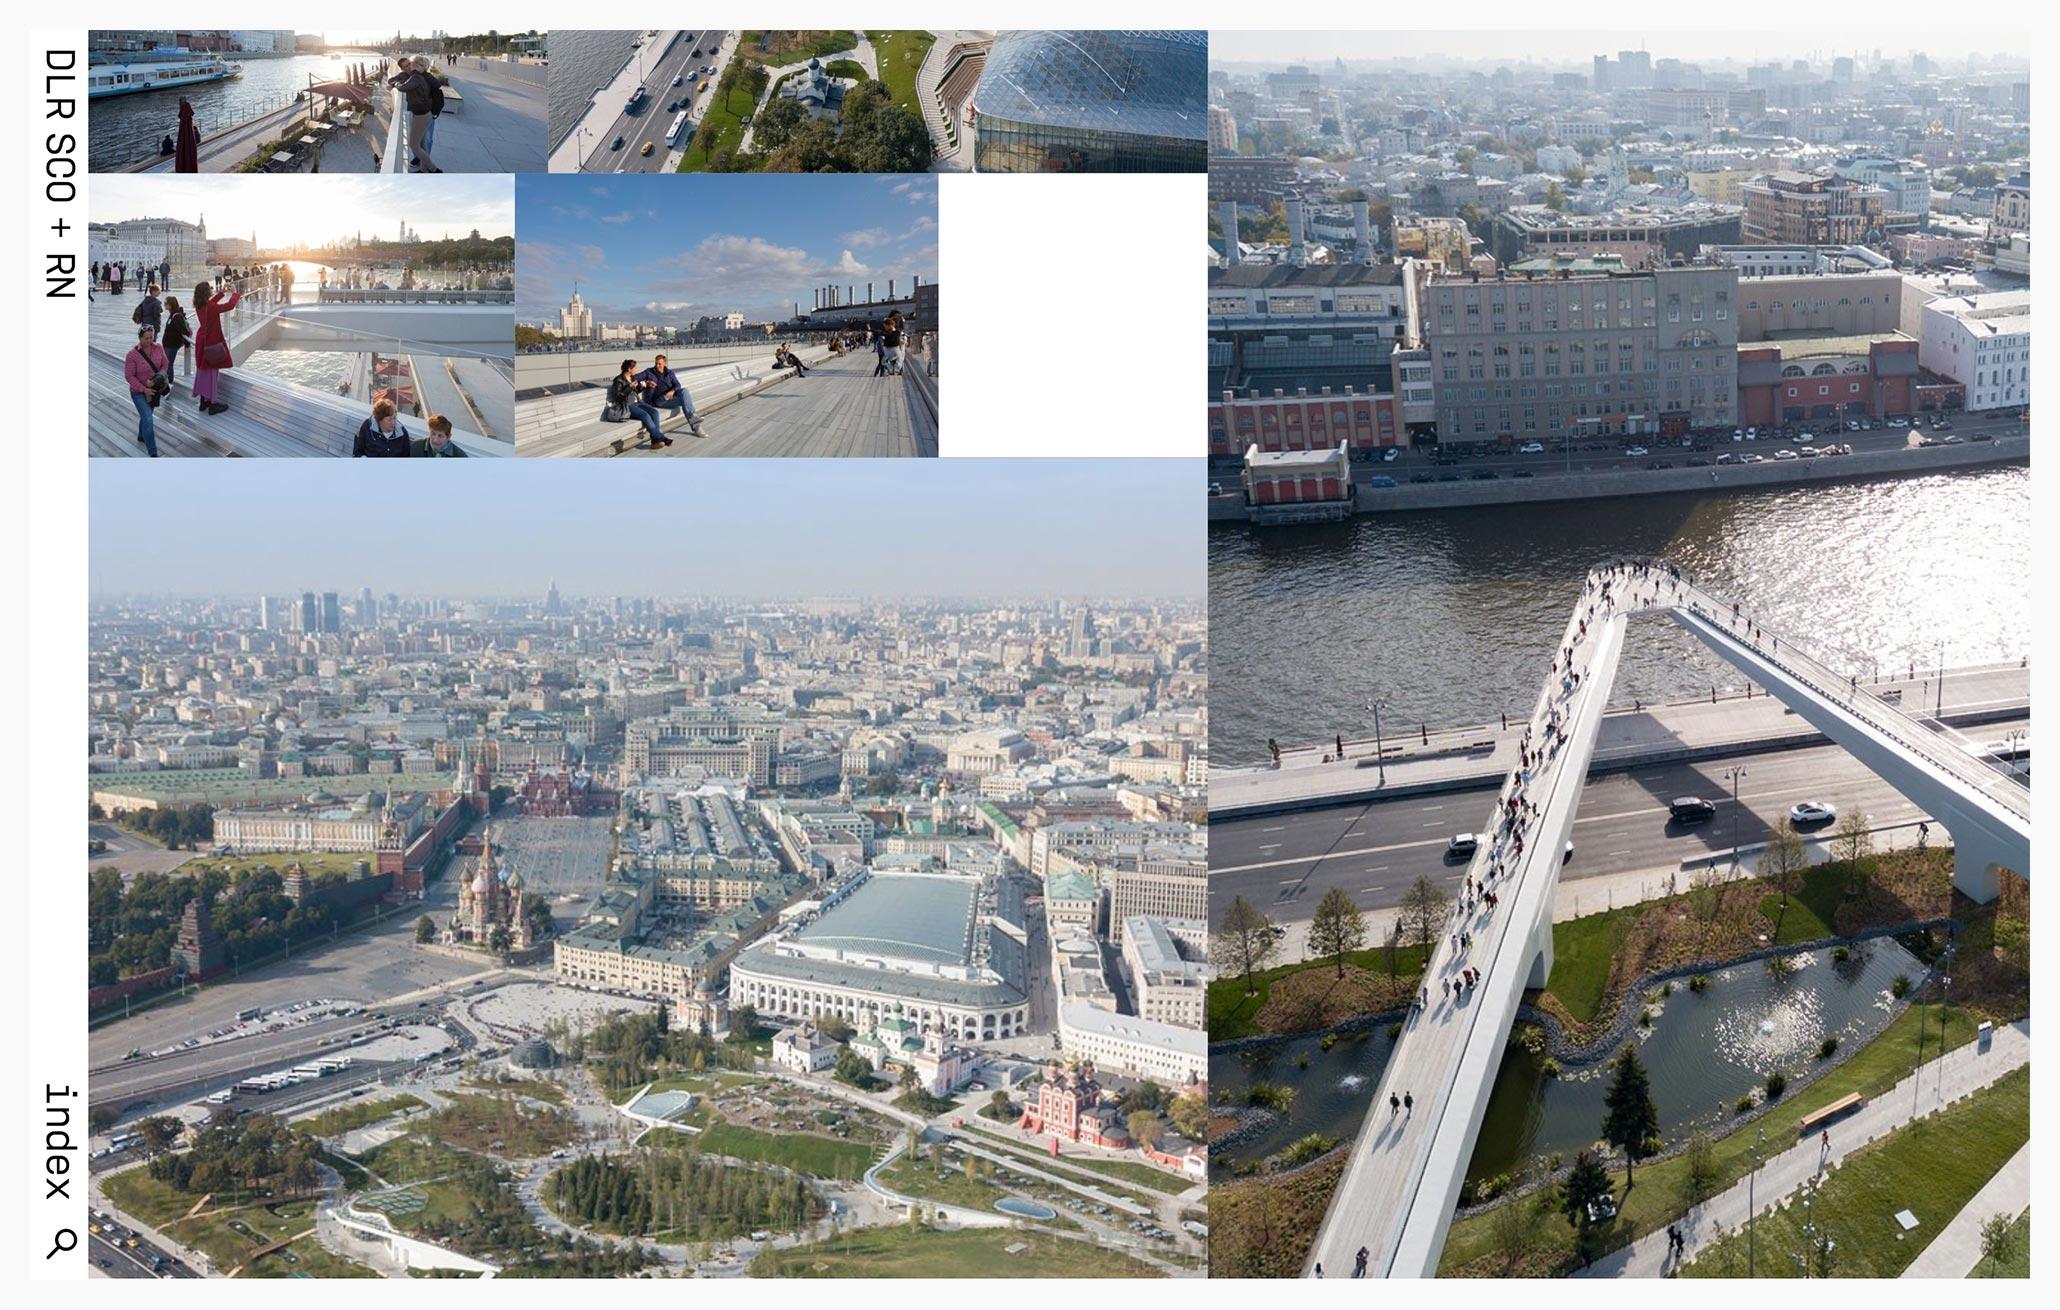 Diller Scofidio + Renfro - Best Architecture Websites 2018